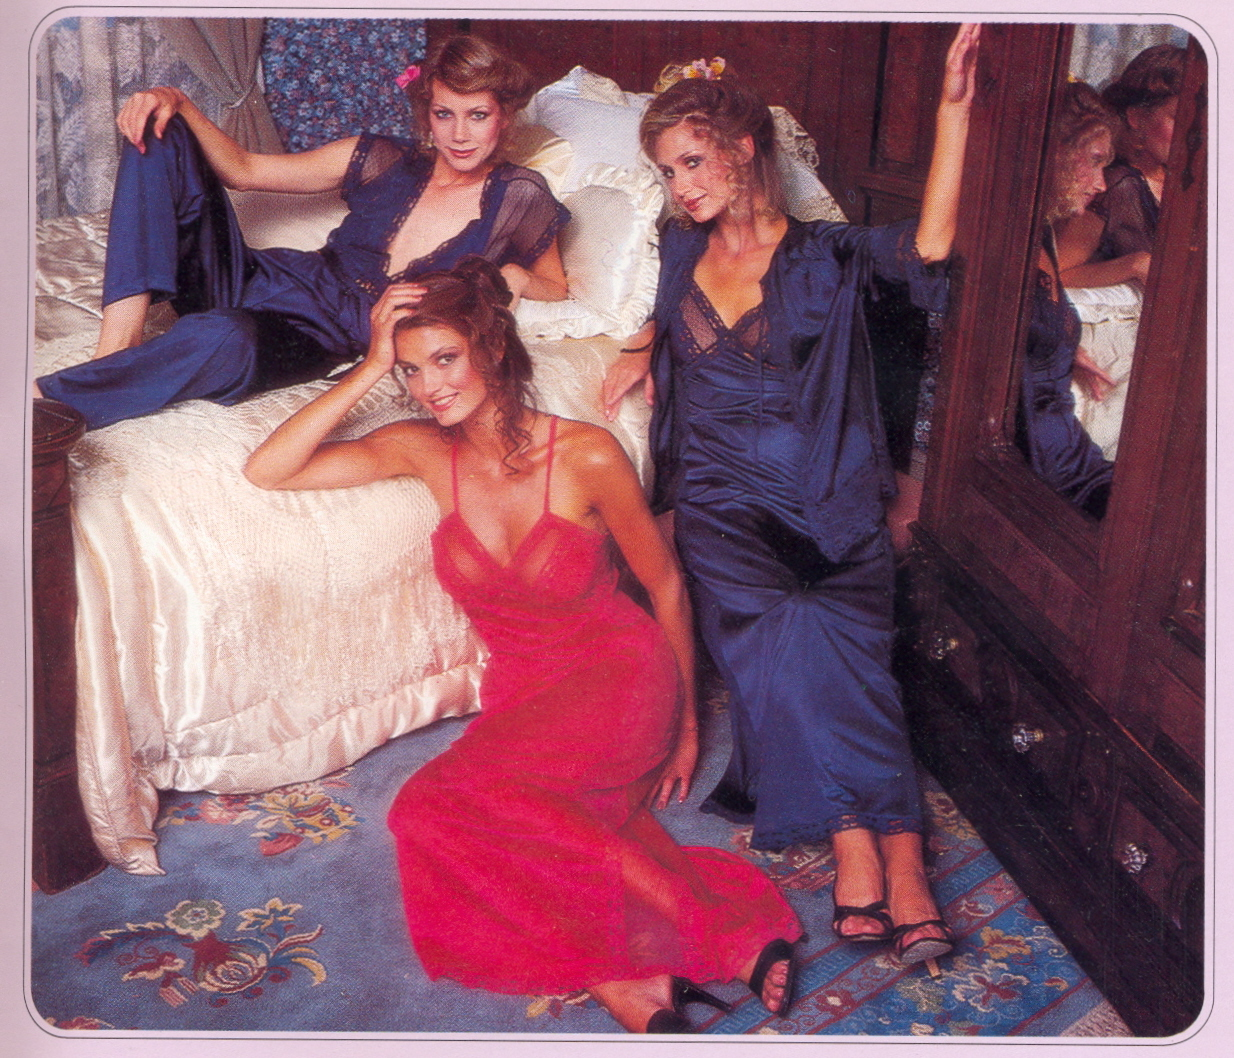 http://4.bp.blogspot.com/-chu2W4q79mY/T5QdRQZ97pI/AAAAAAAA1eg/G4dqCvF6K5U/s1600/Victoria+Secret+Catalogue+1979+051.jpg